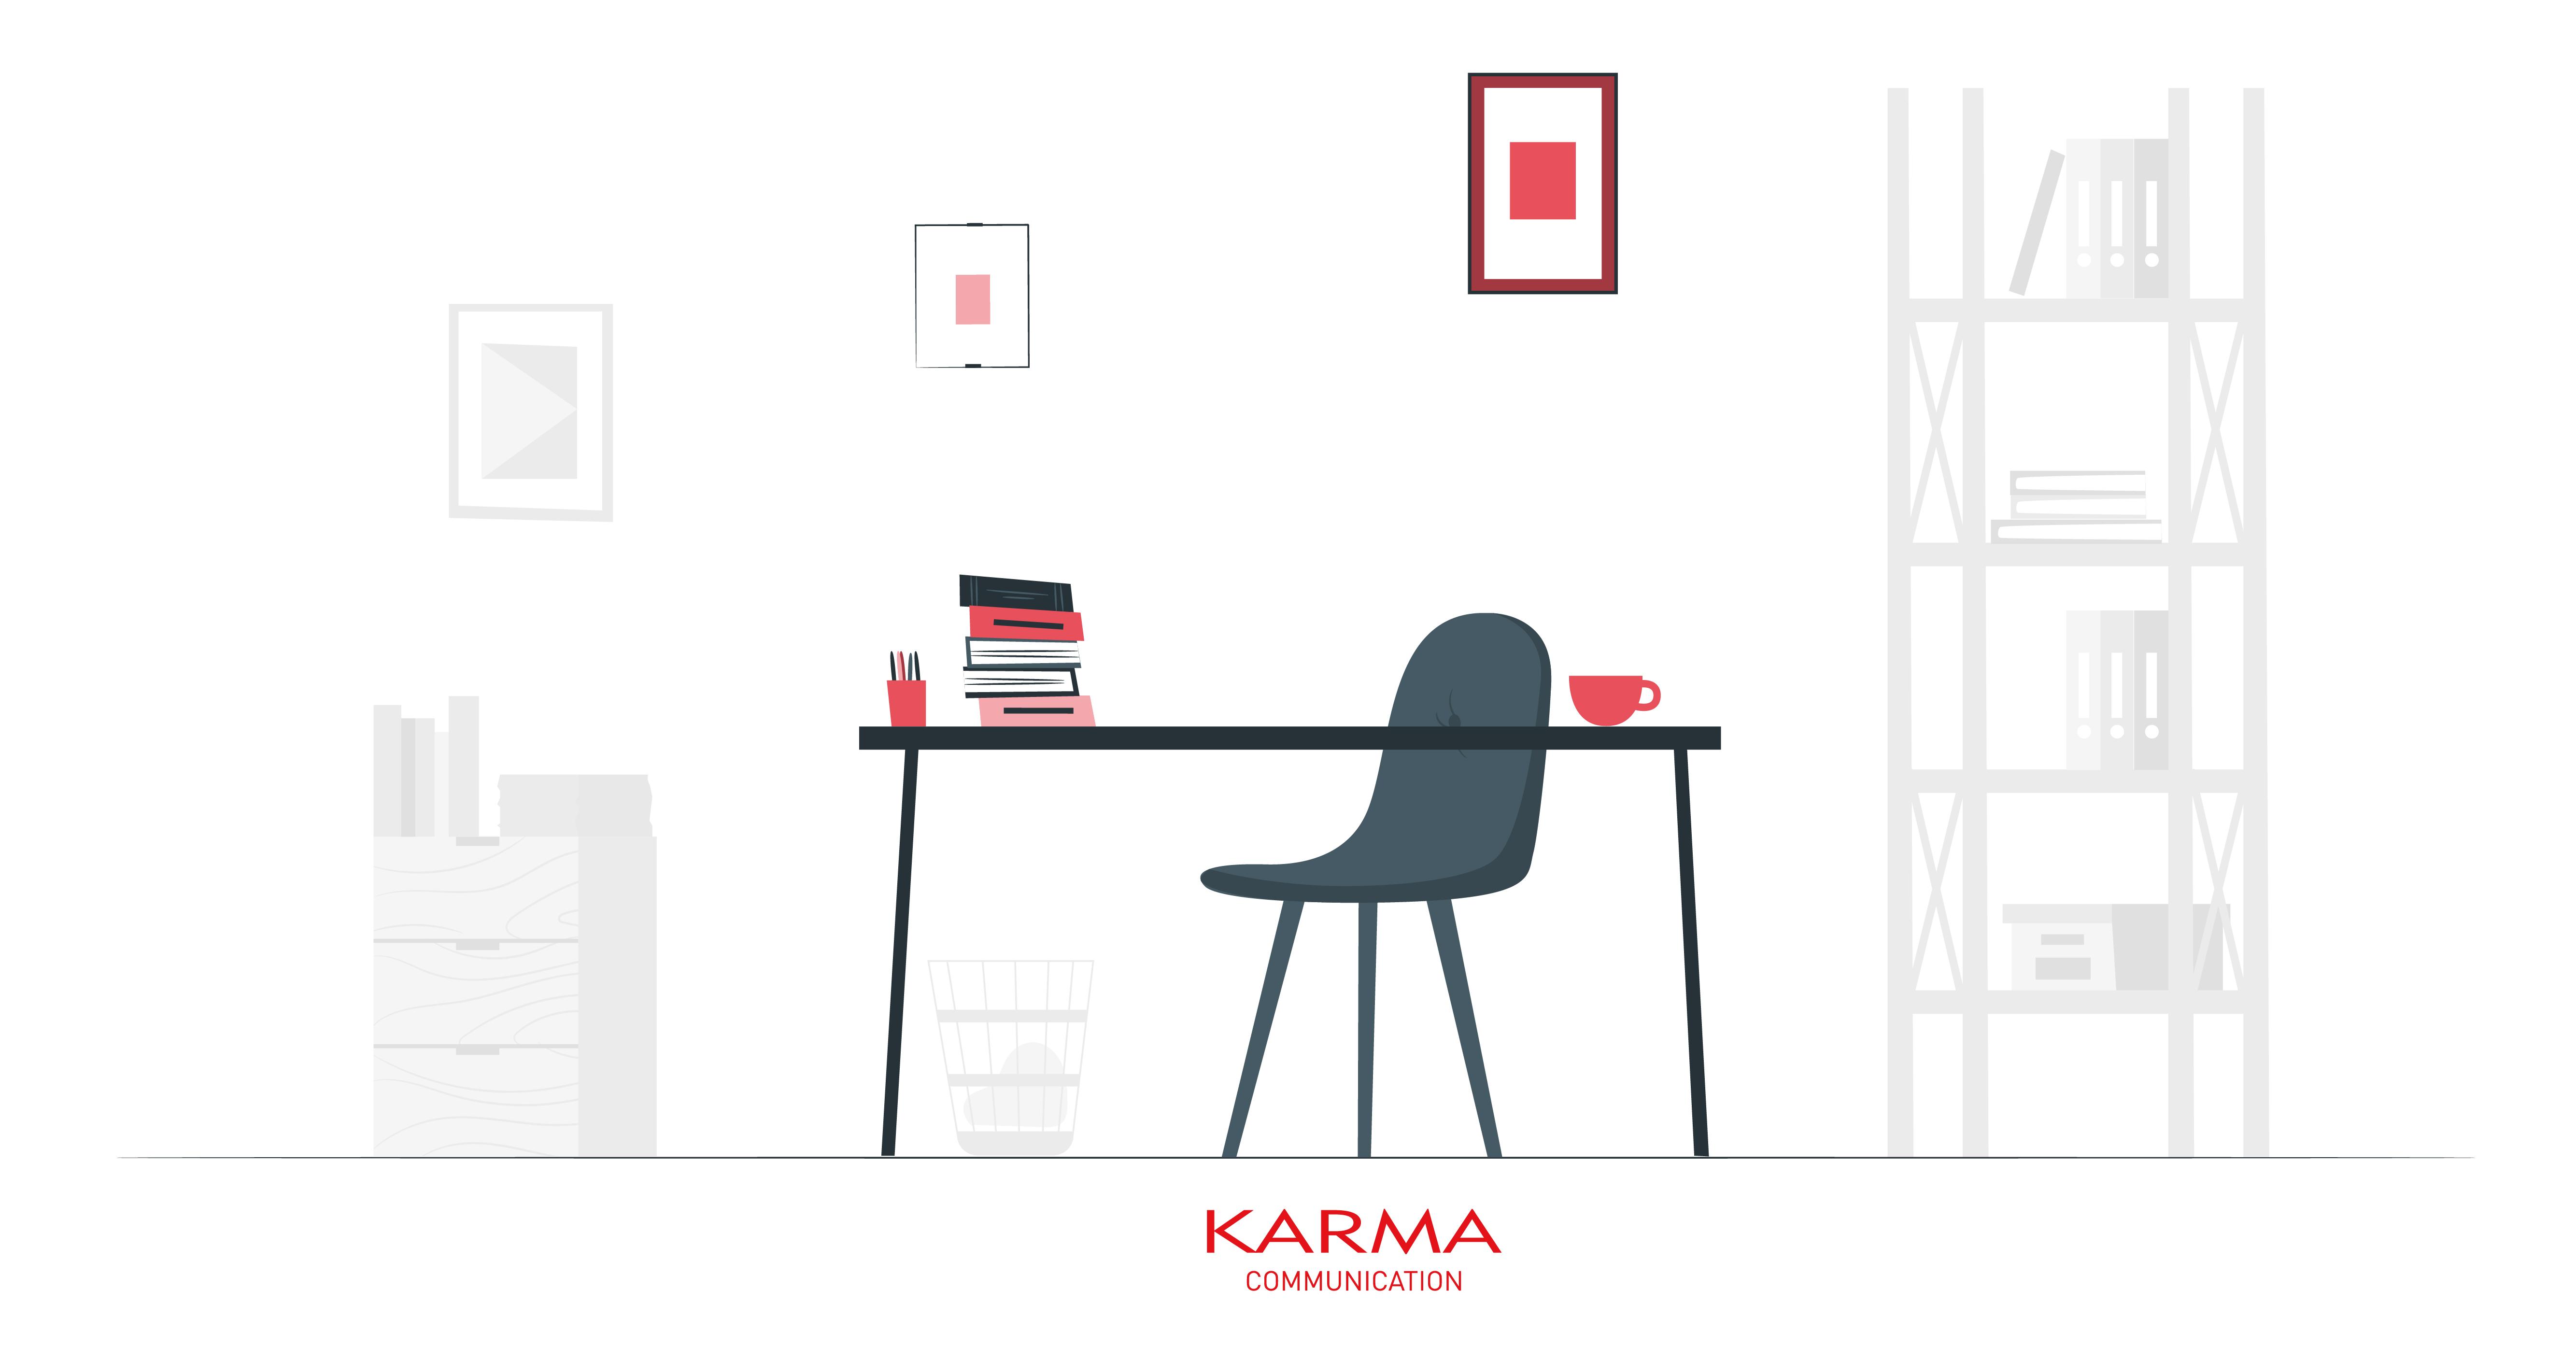 Karma Communication - Ufficio on the road